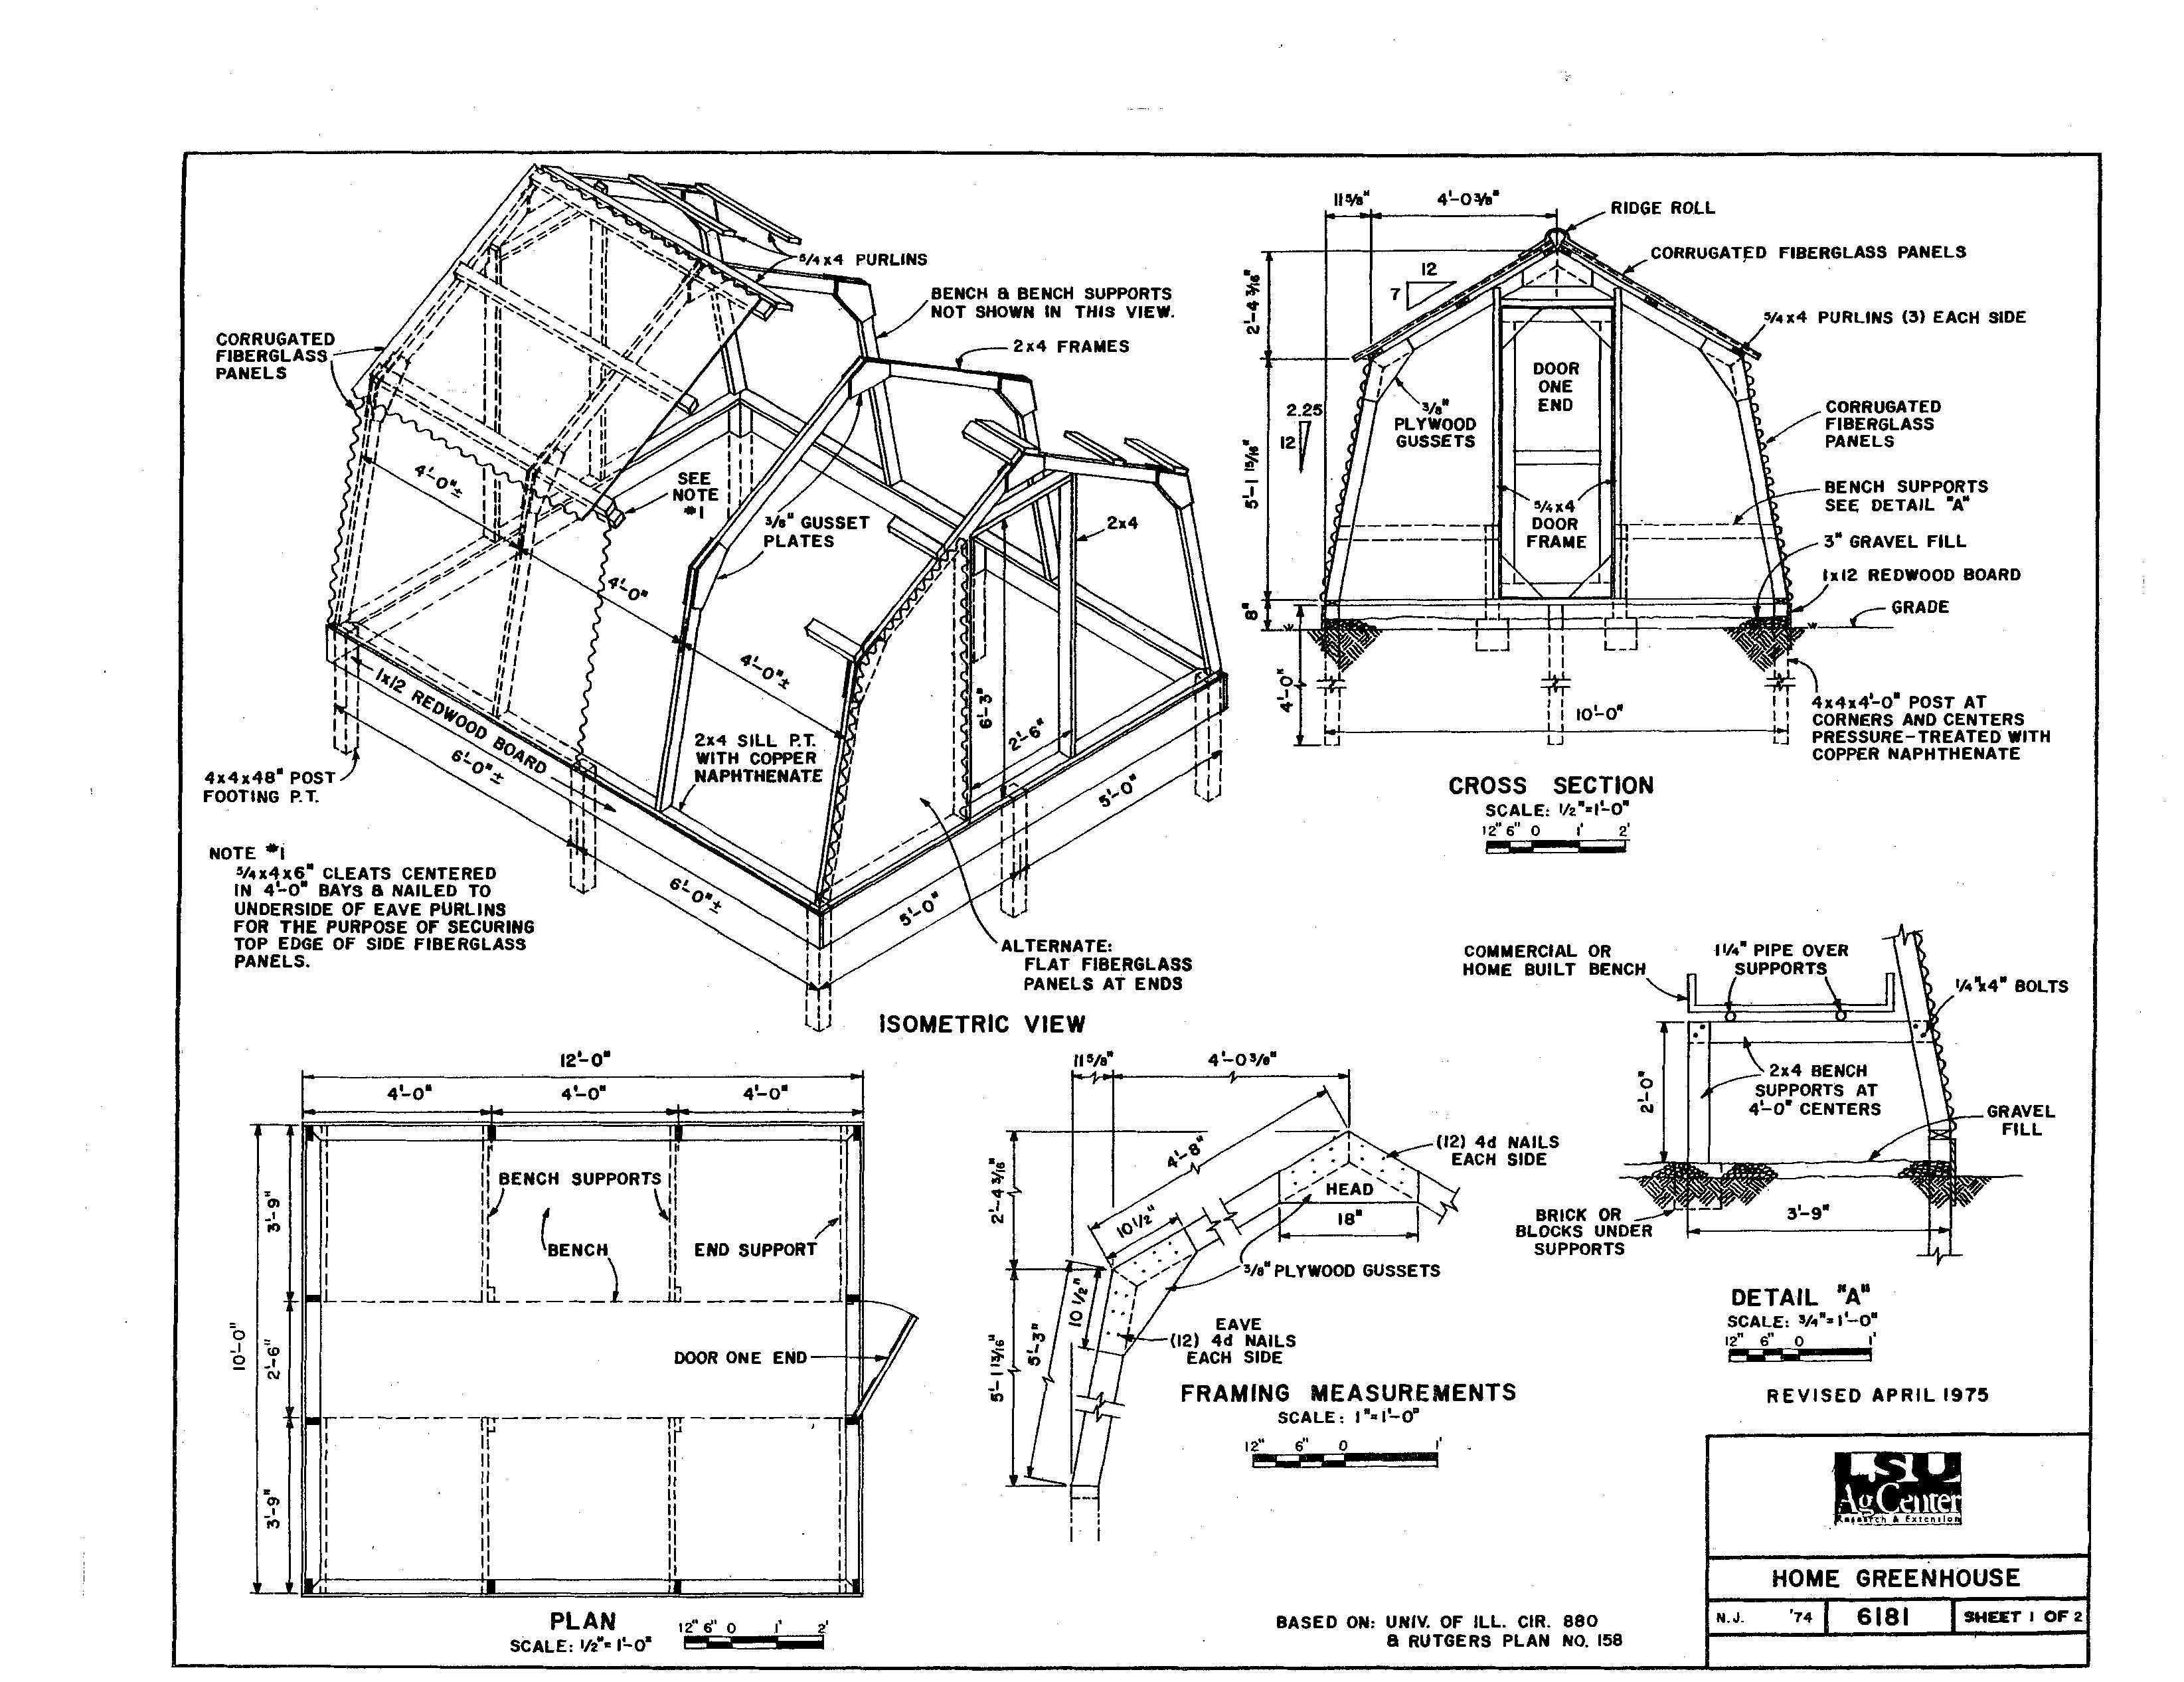 Home Greenhouse Home Greenhouse Diy Greenhouse Plans Greenhouse Plans